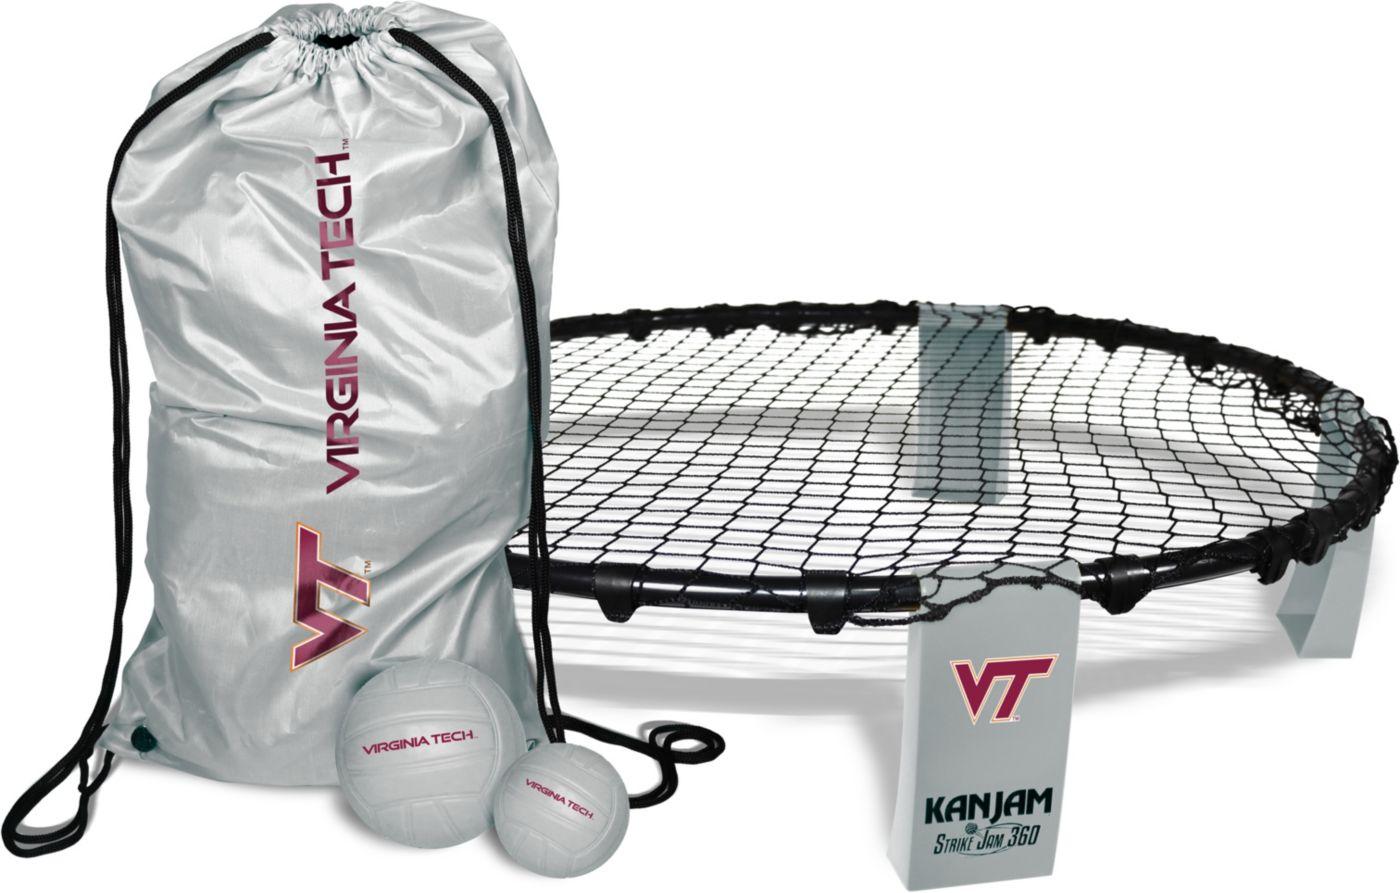 Wild Sports Virginia Tech Hokies Strike Jam Combo Game